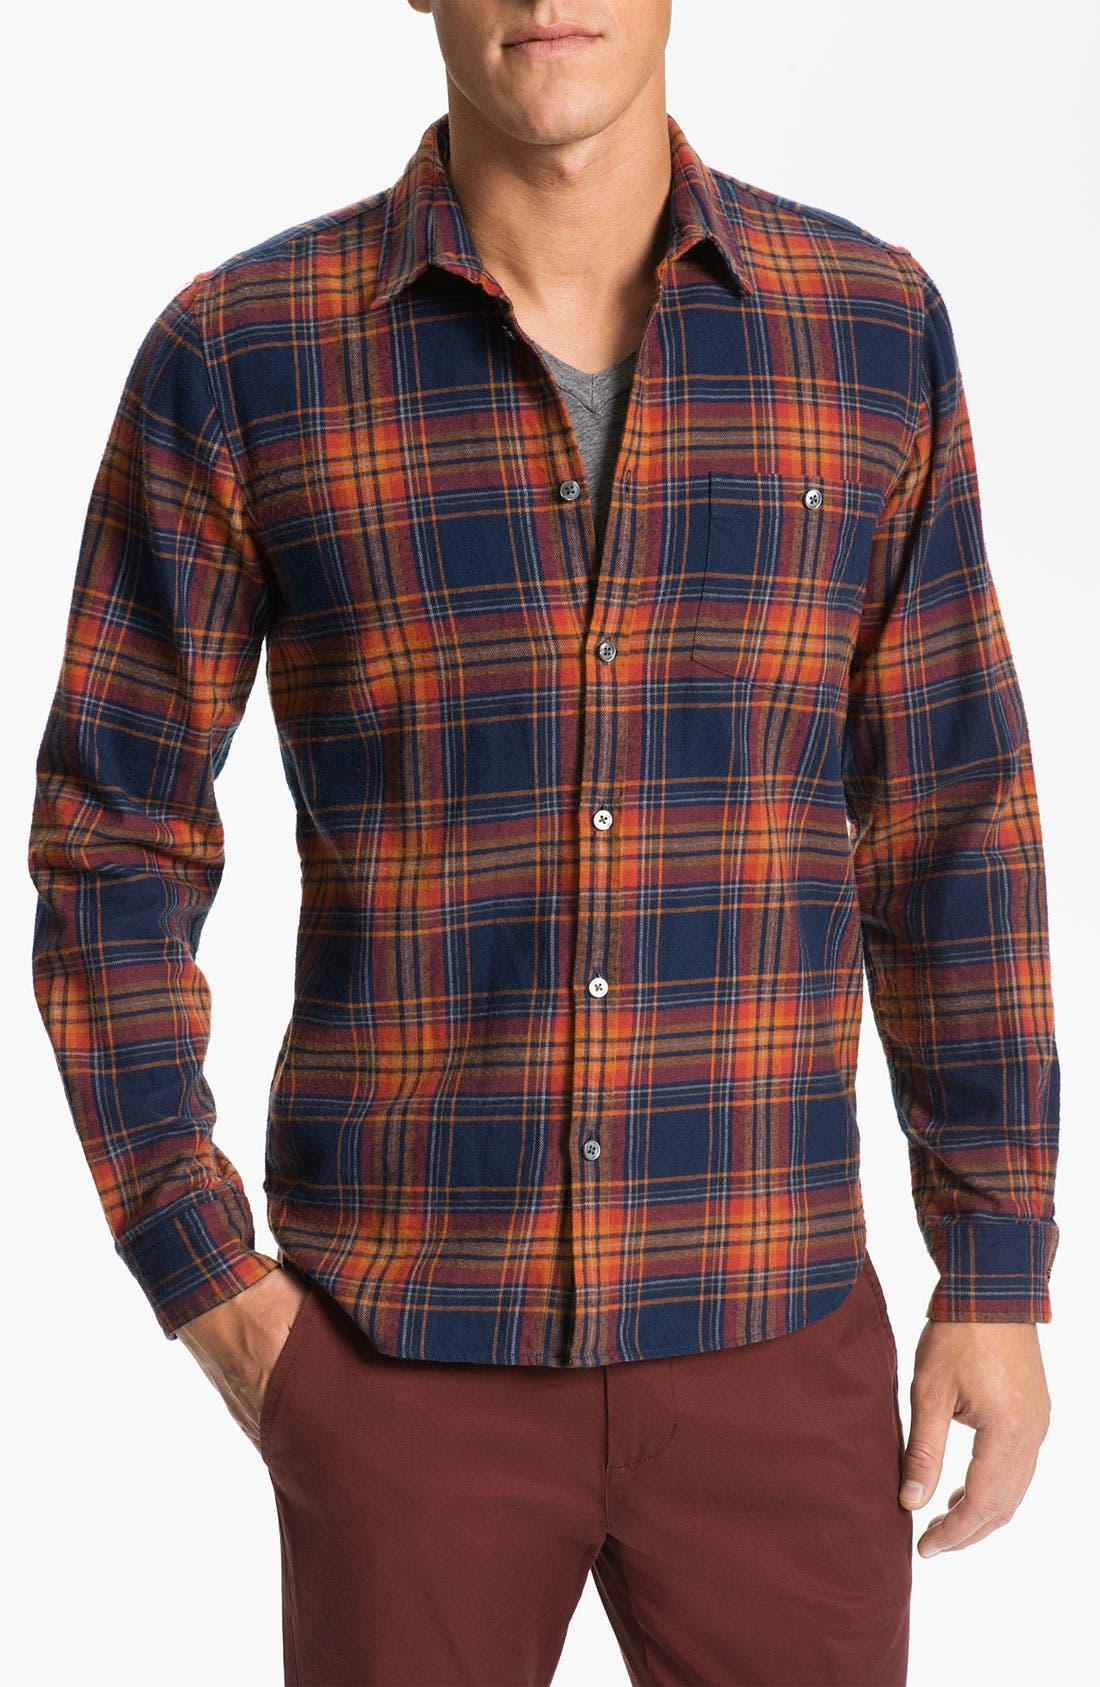 Alternate Image 1 Selected - MARC BY MARC JACOBS 'Mikhail' Cotton Flannel Shirt